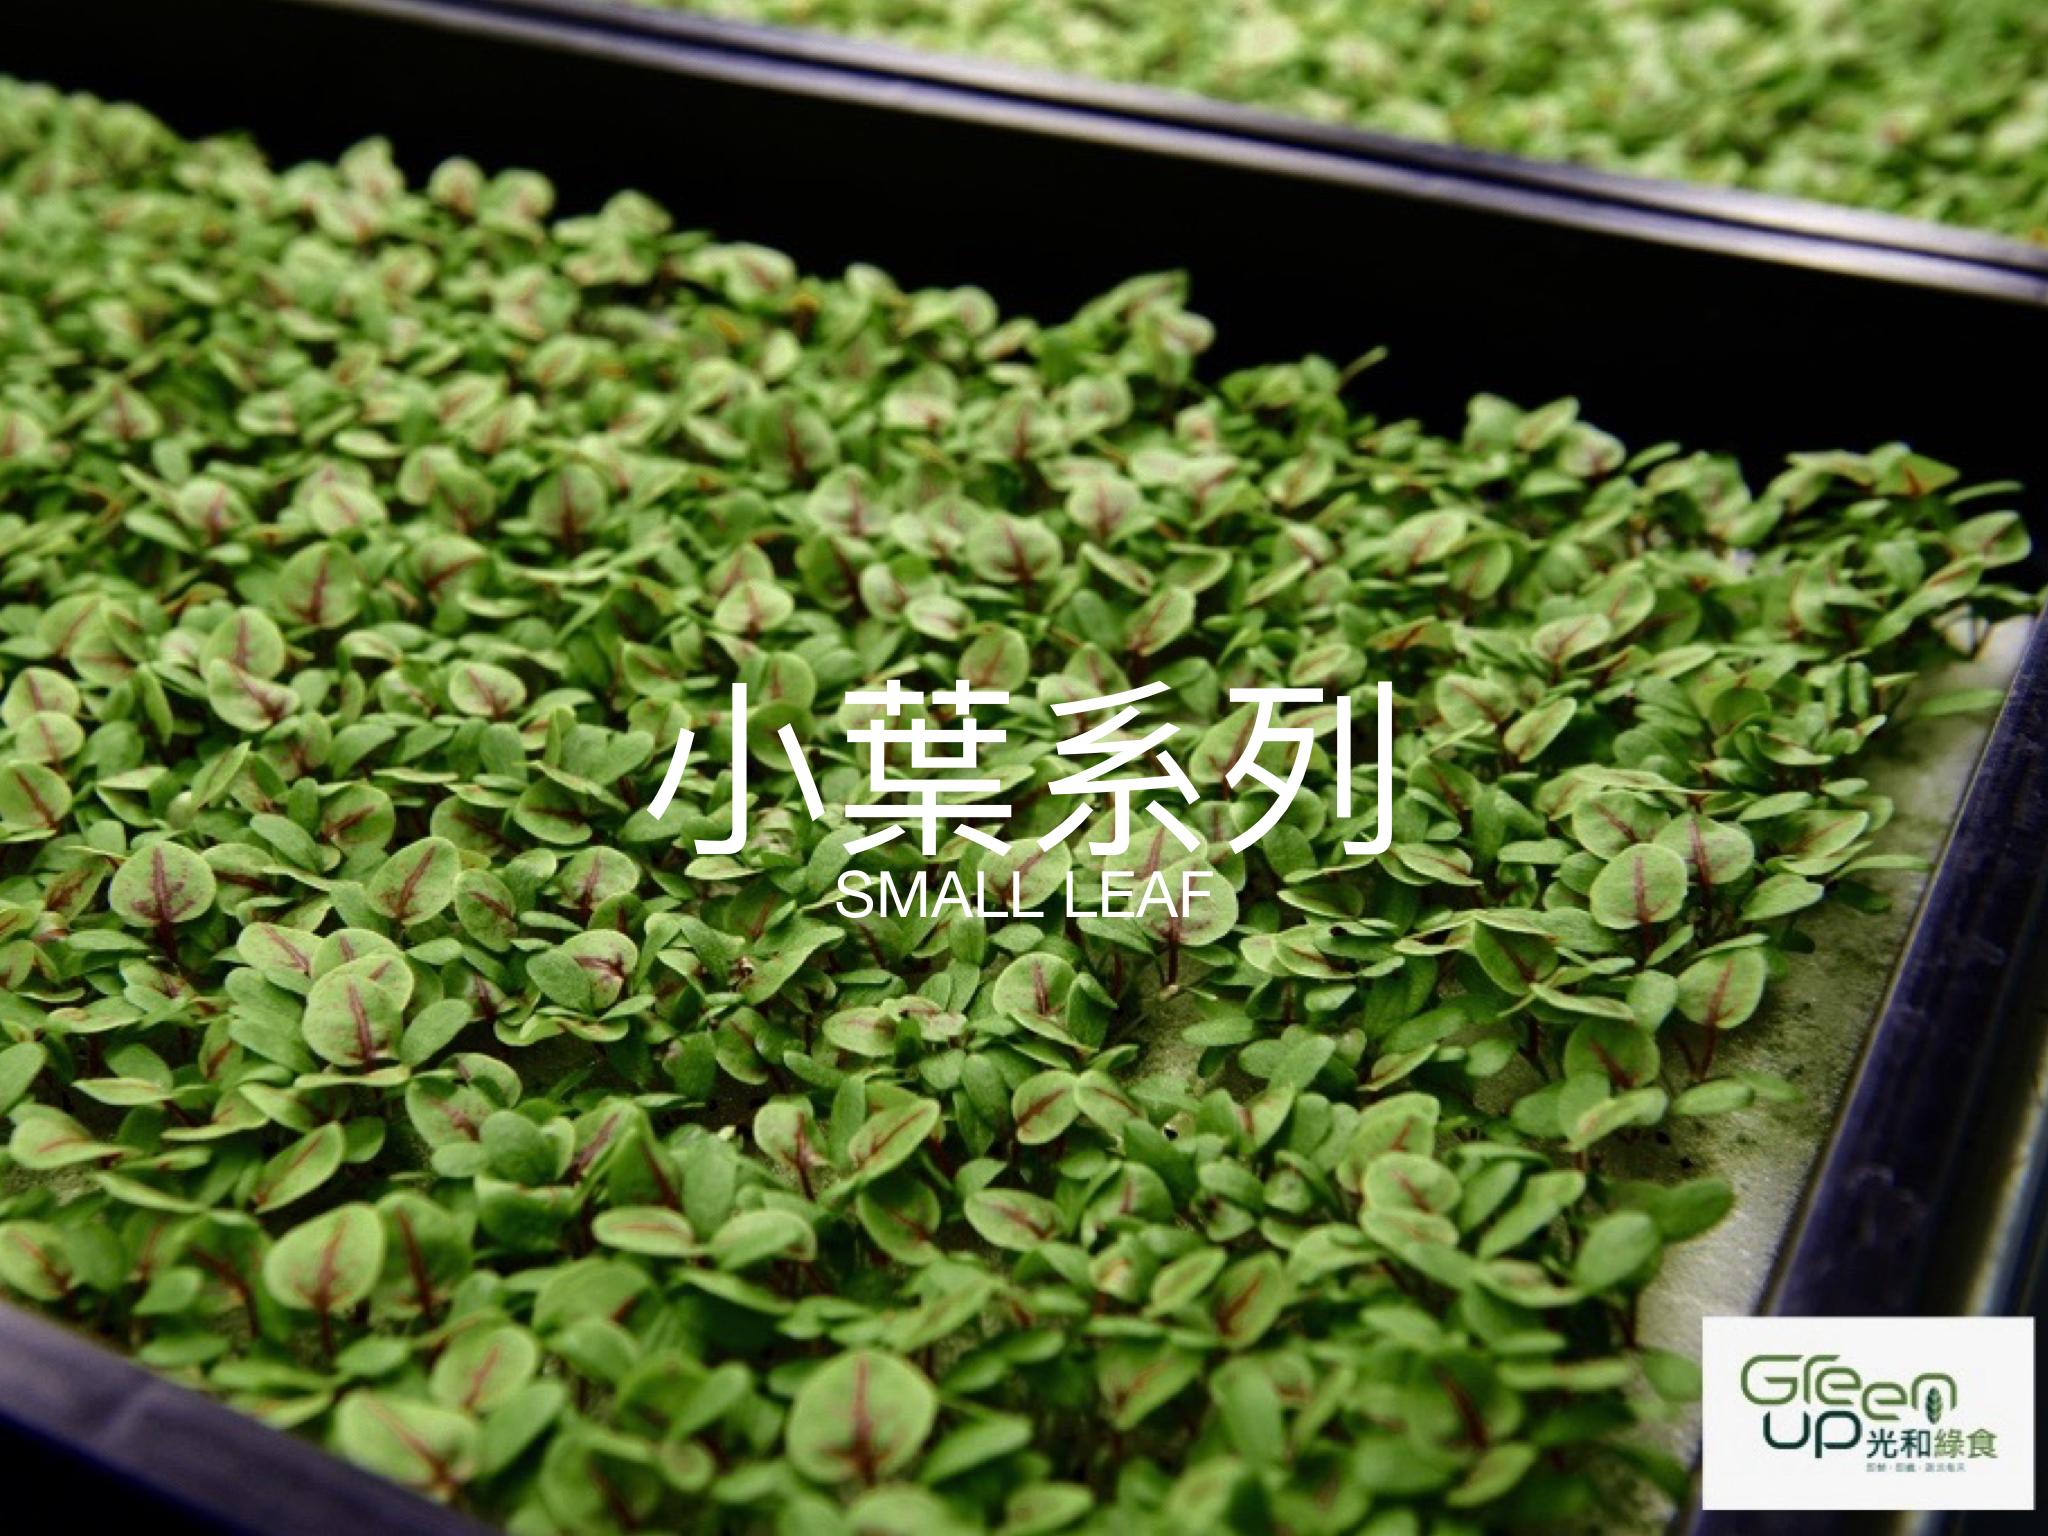 green up 蔬菜介紹 個別圖片.002.jpeg